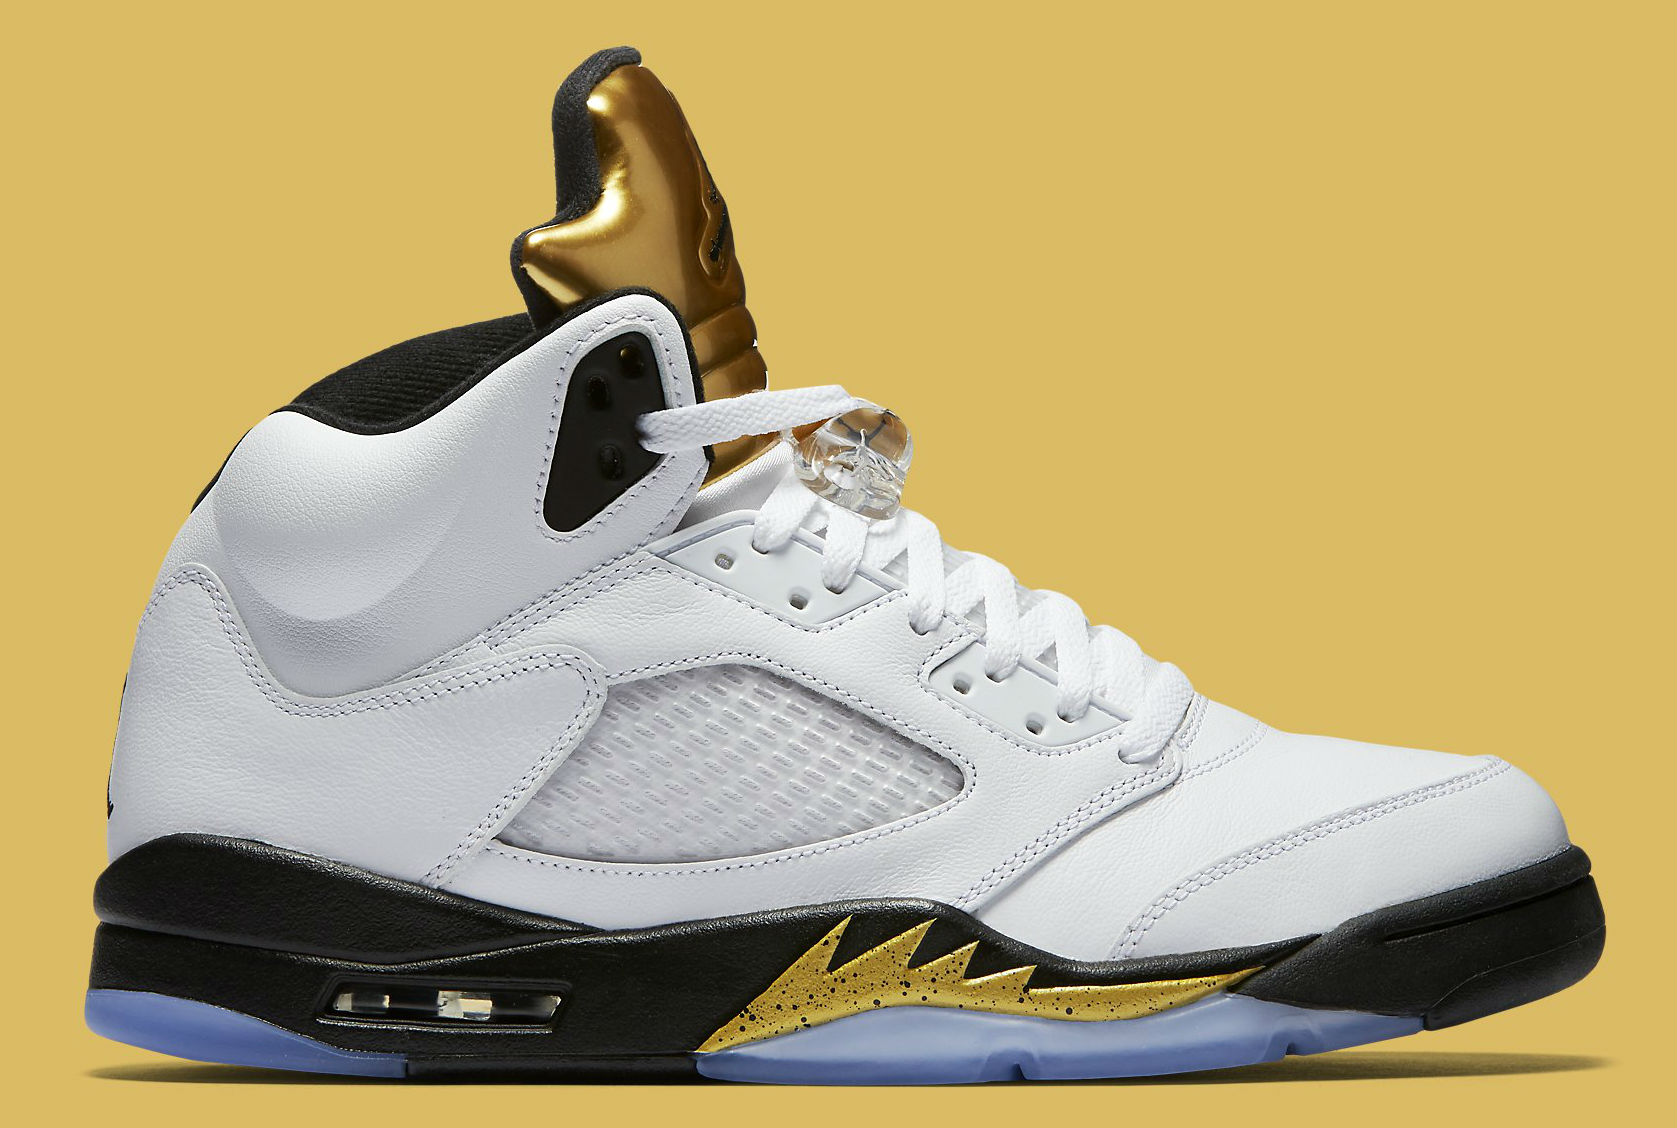 newest 7e564 2e305 Gold Jordan 5 Release Date 136027-133 | Sole Collector